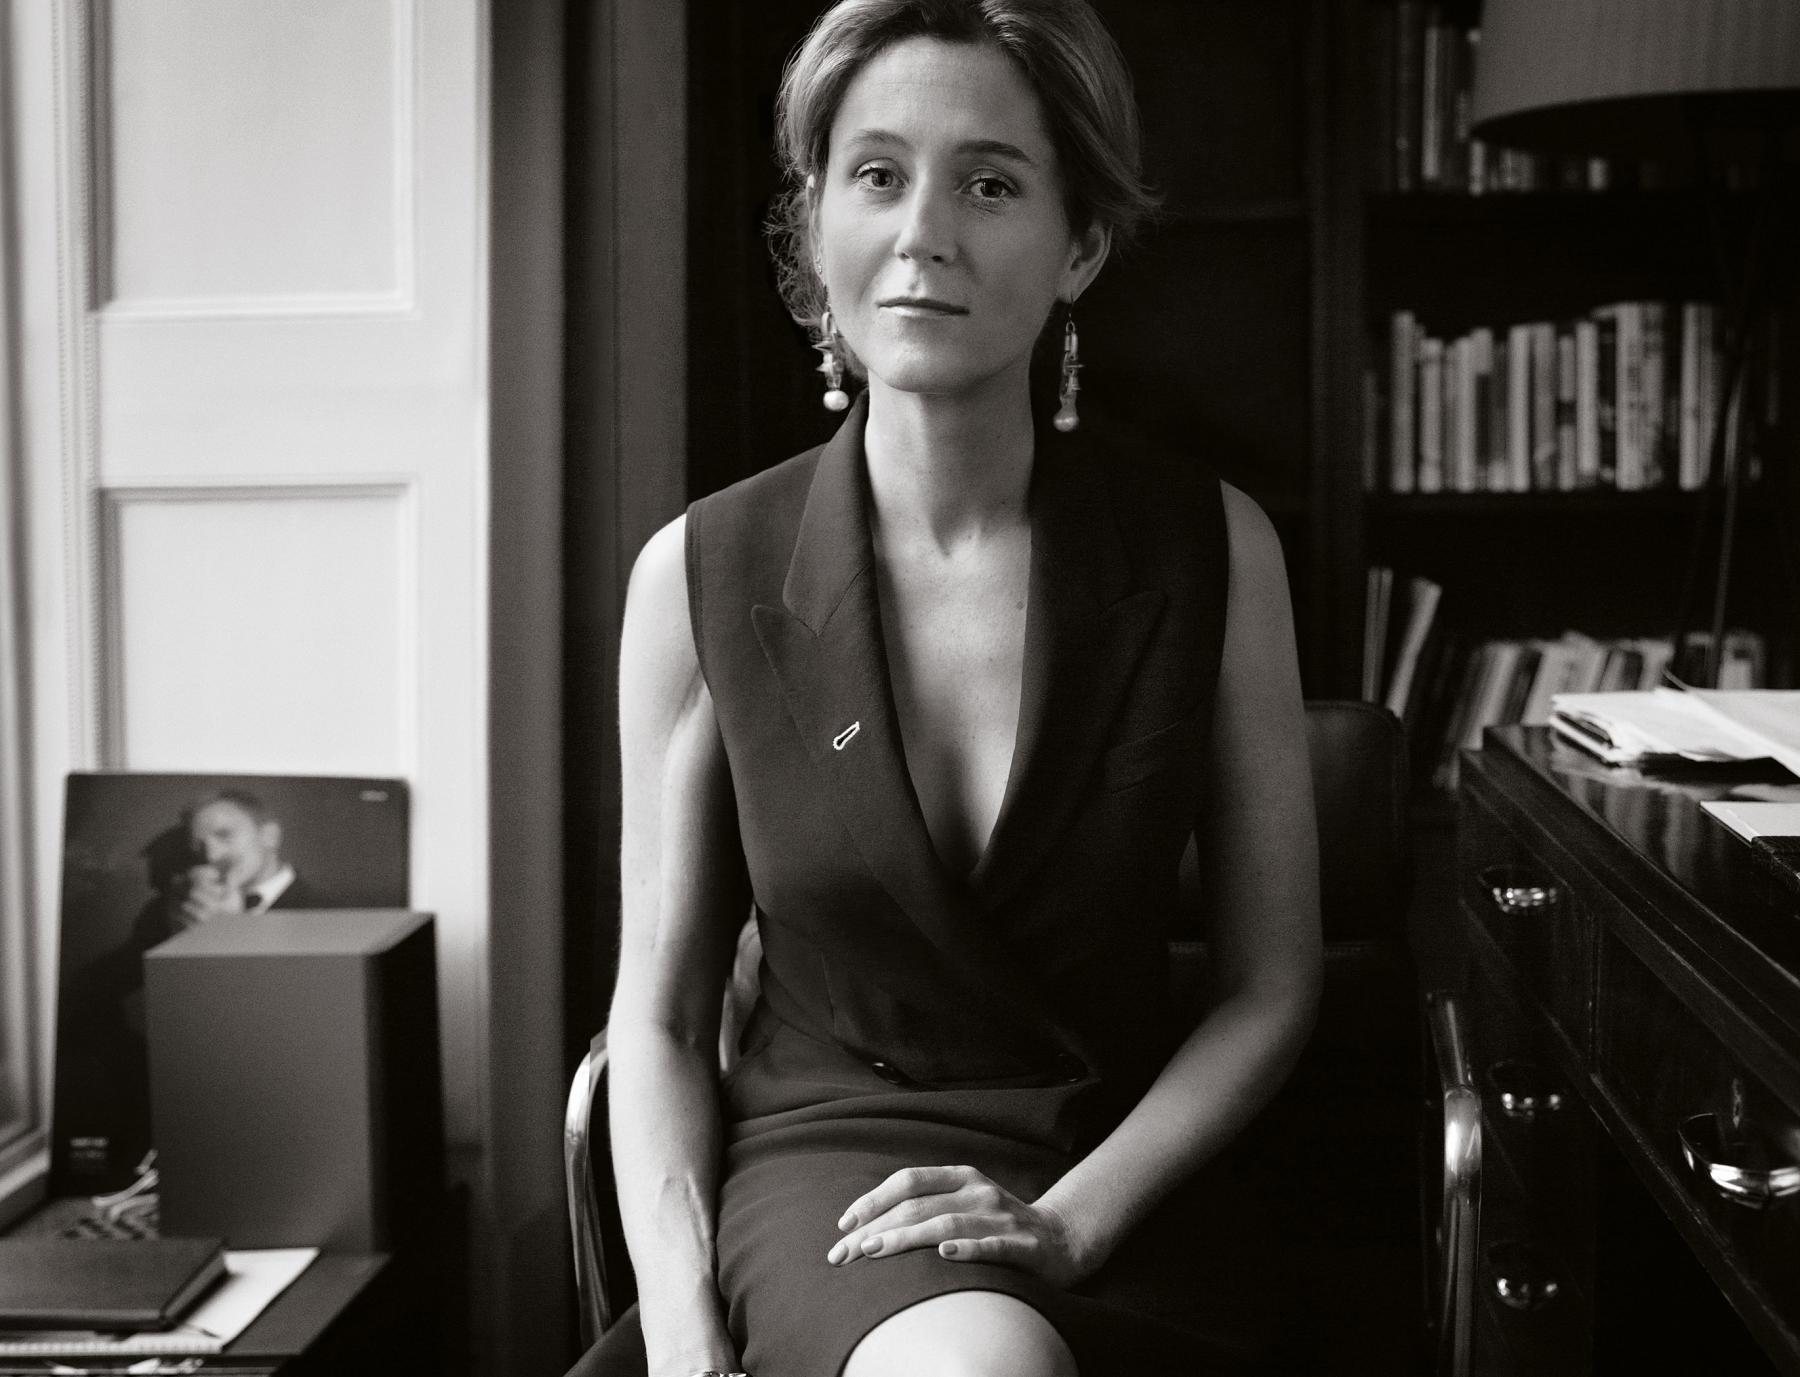 The Gentlewoman Martha Lane Fox